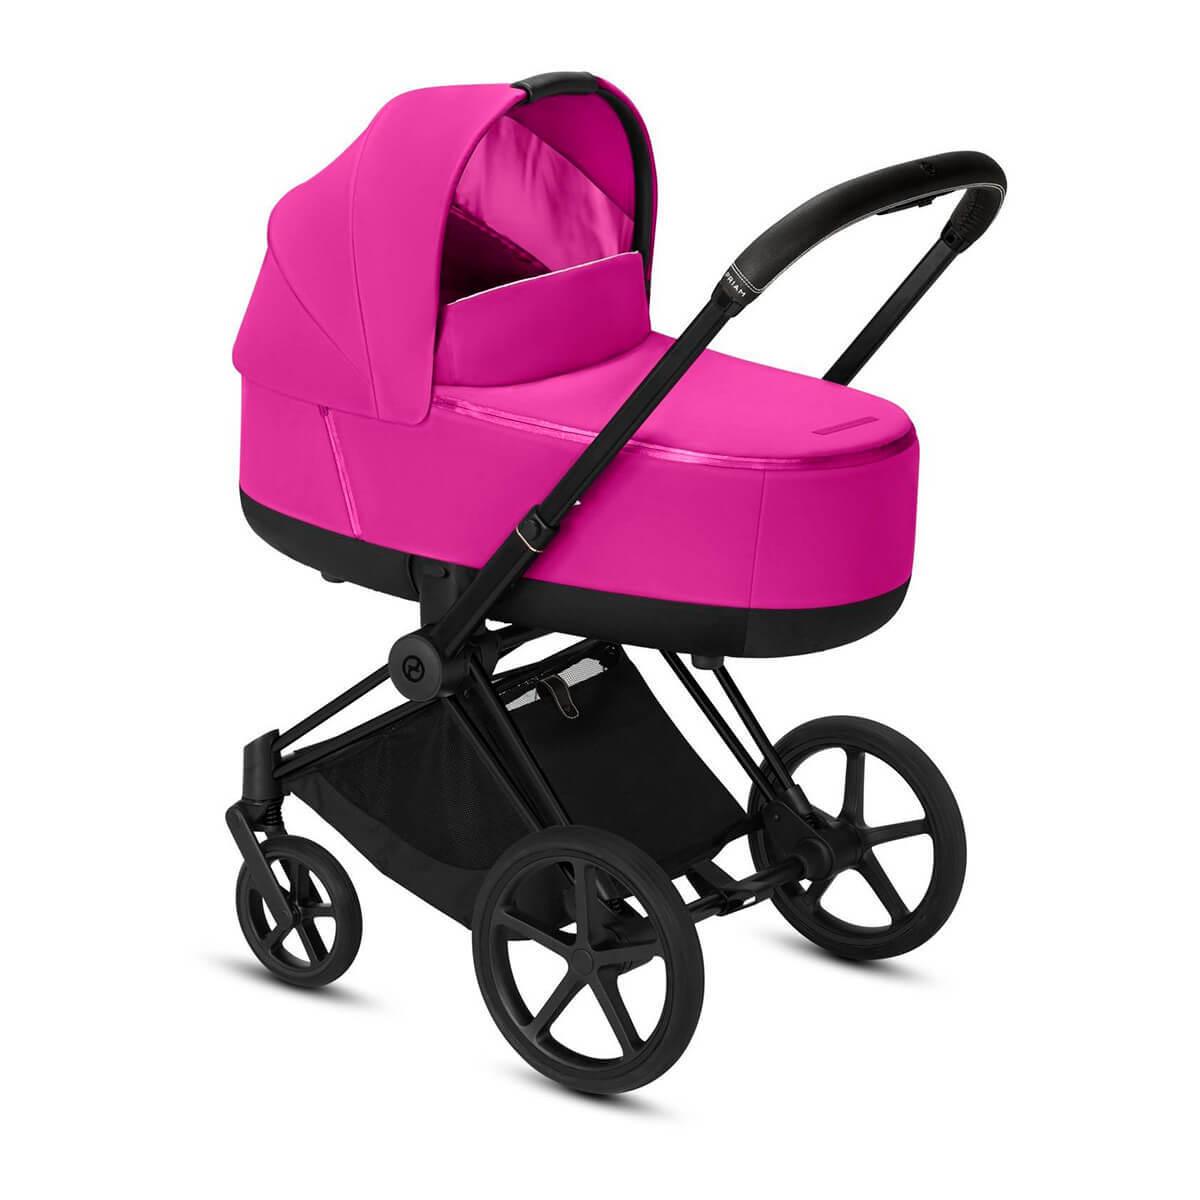 Цвета Cybex Priam для новорожденных Коляска для новорожденных Cybex Priam III Fancy Pink на шасси Matt Black cybex-priam-iii-fancy-pink-frame-matt-black.jpg